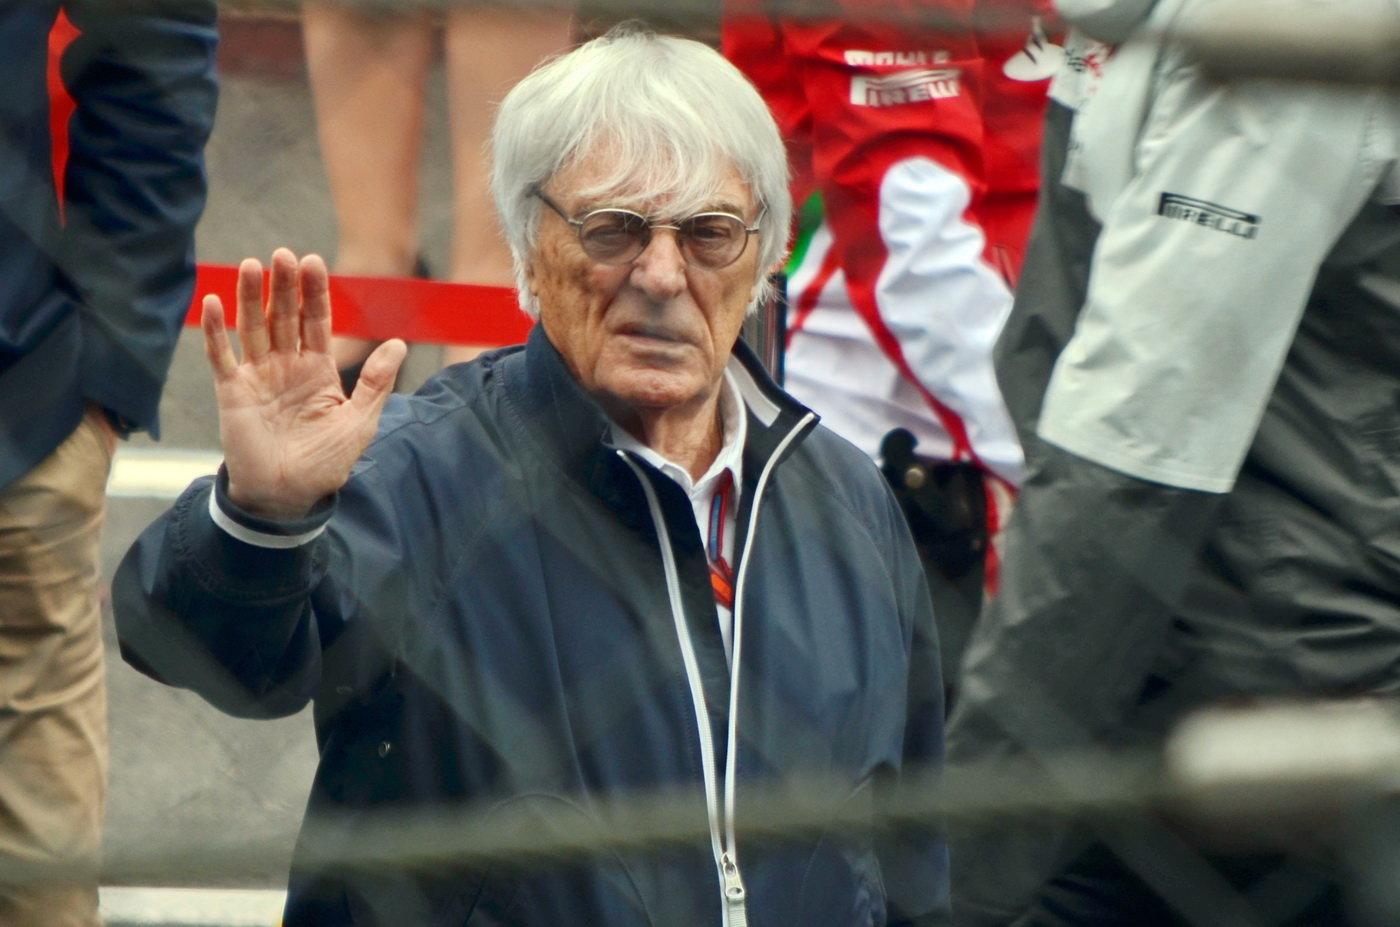 Bernie Ecclestone, GP Rakouska (Red Bull Ring)